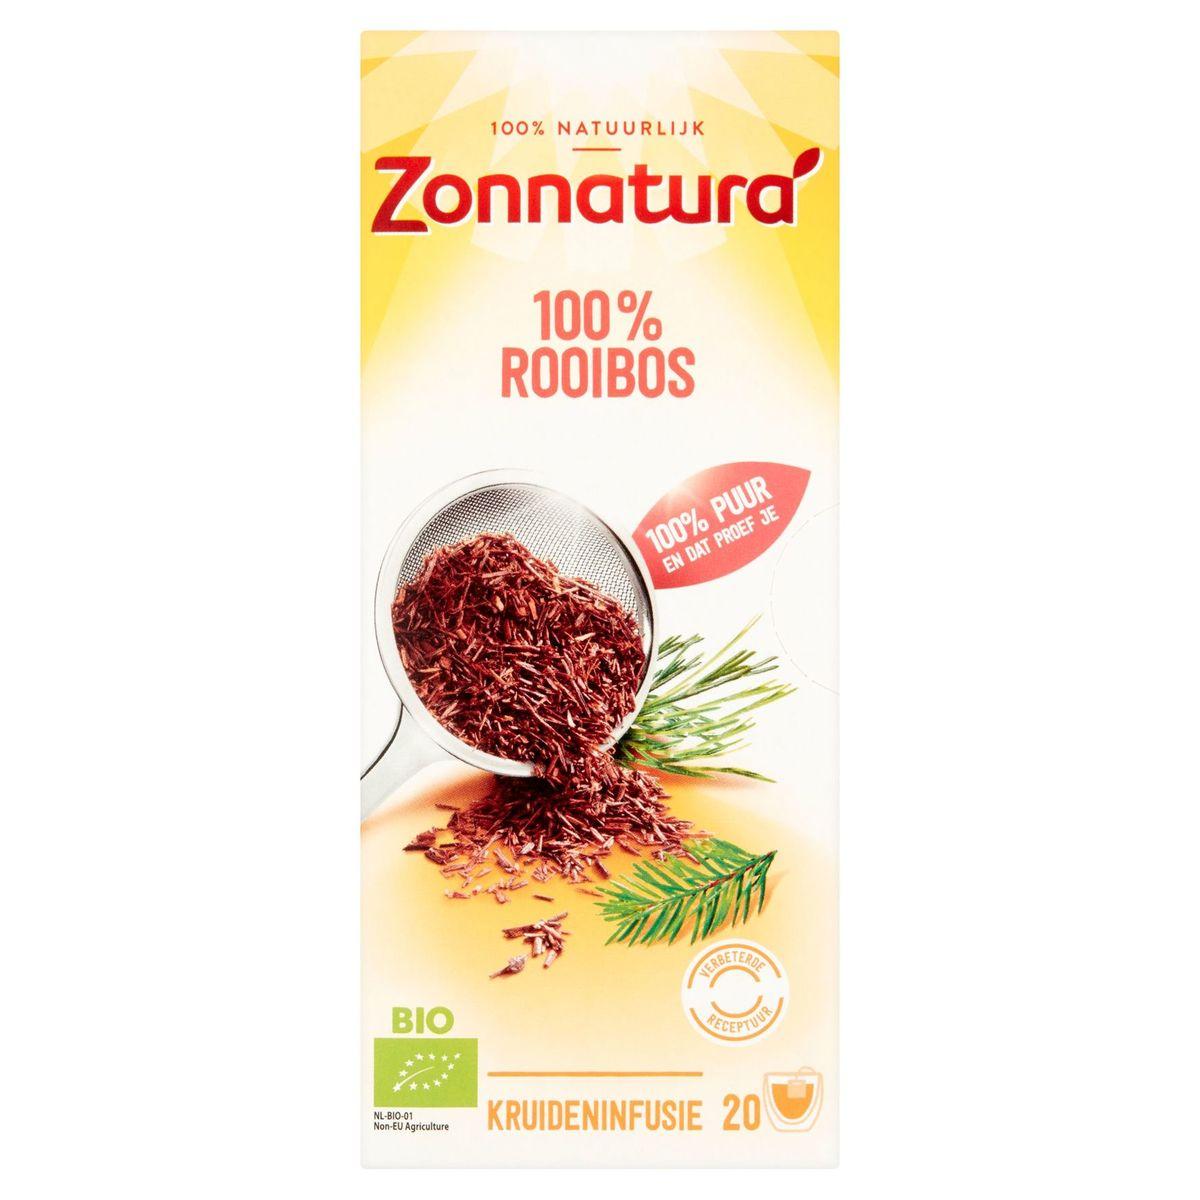 Zonnaturà Bio 100% Rooibos 20 Sachets 31 g